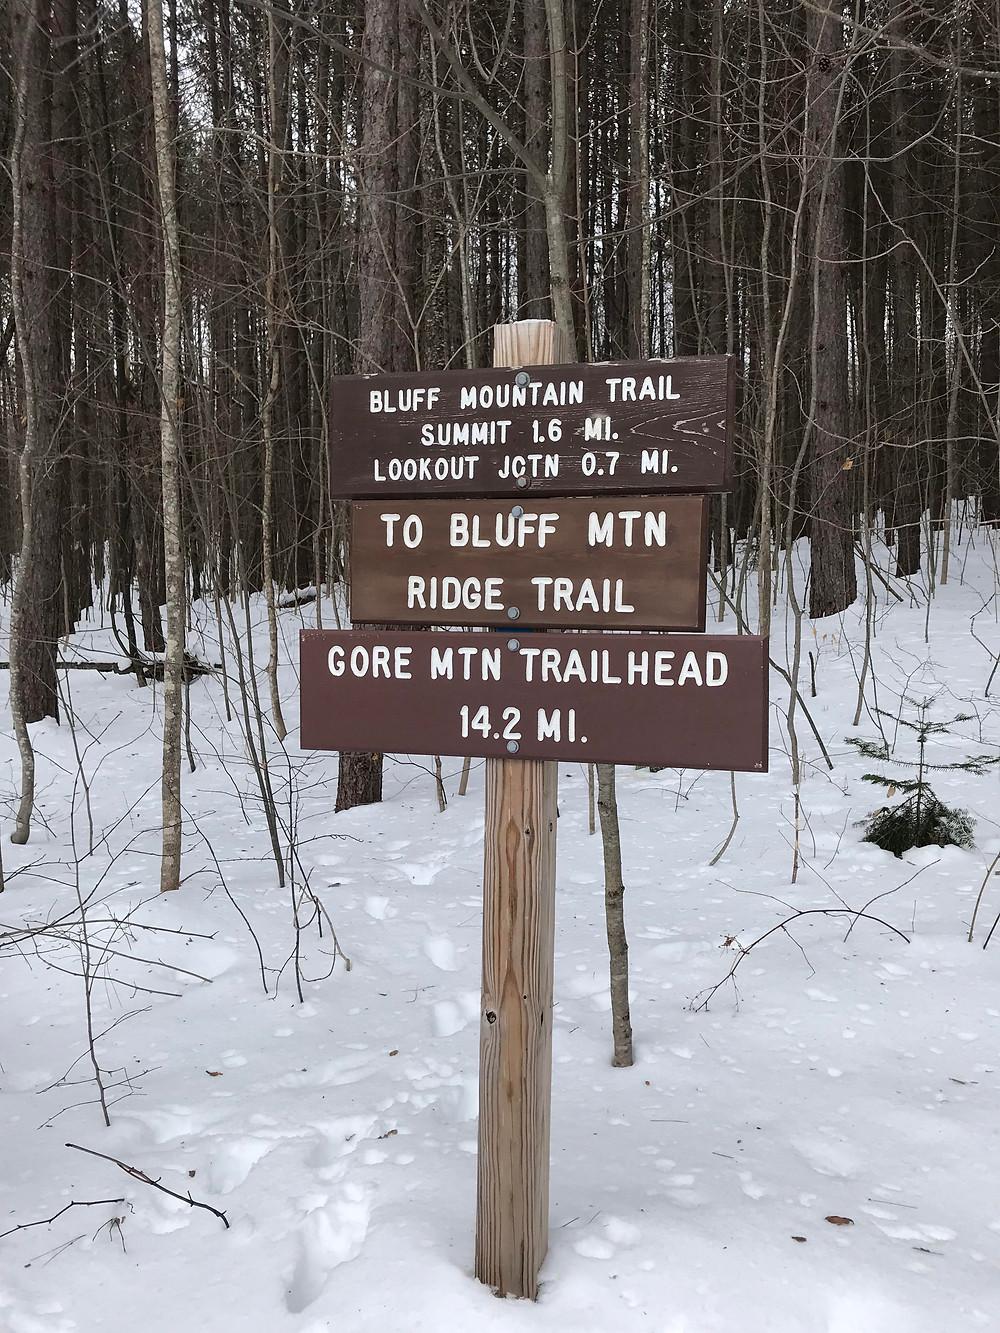 Start of Bluff Mountain Trail